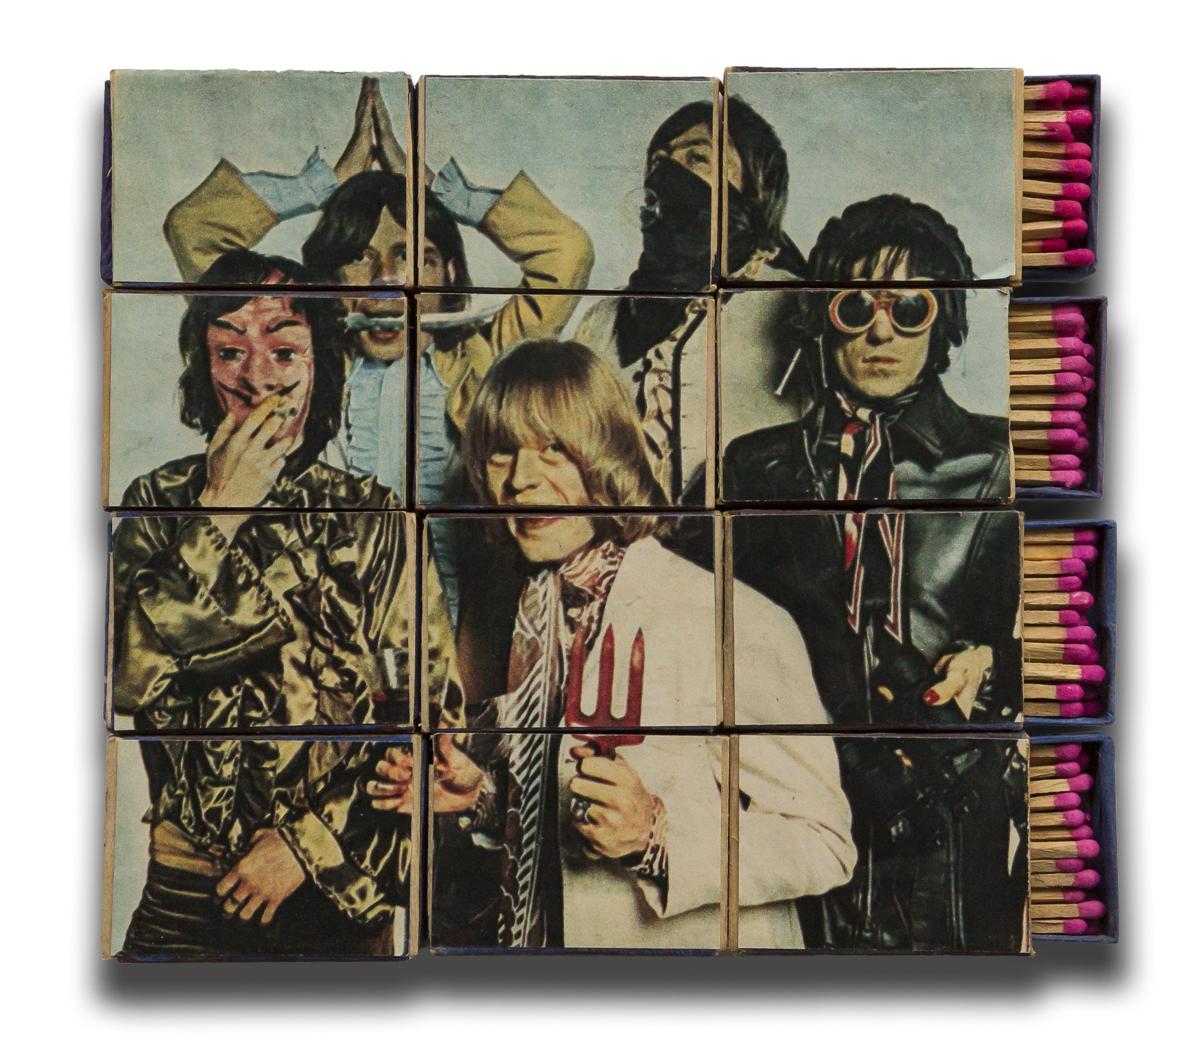 Marko Pogačnik (OHO group), Rolling Stones Matchboxes, 1967, mixed media, matchboxes.